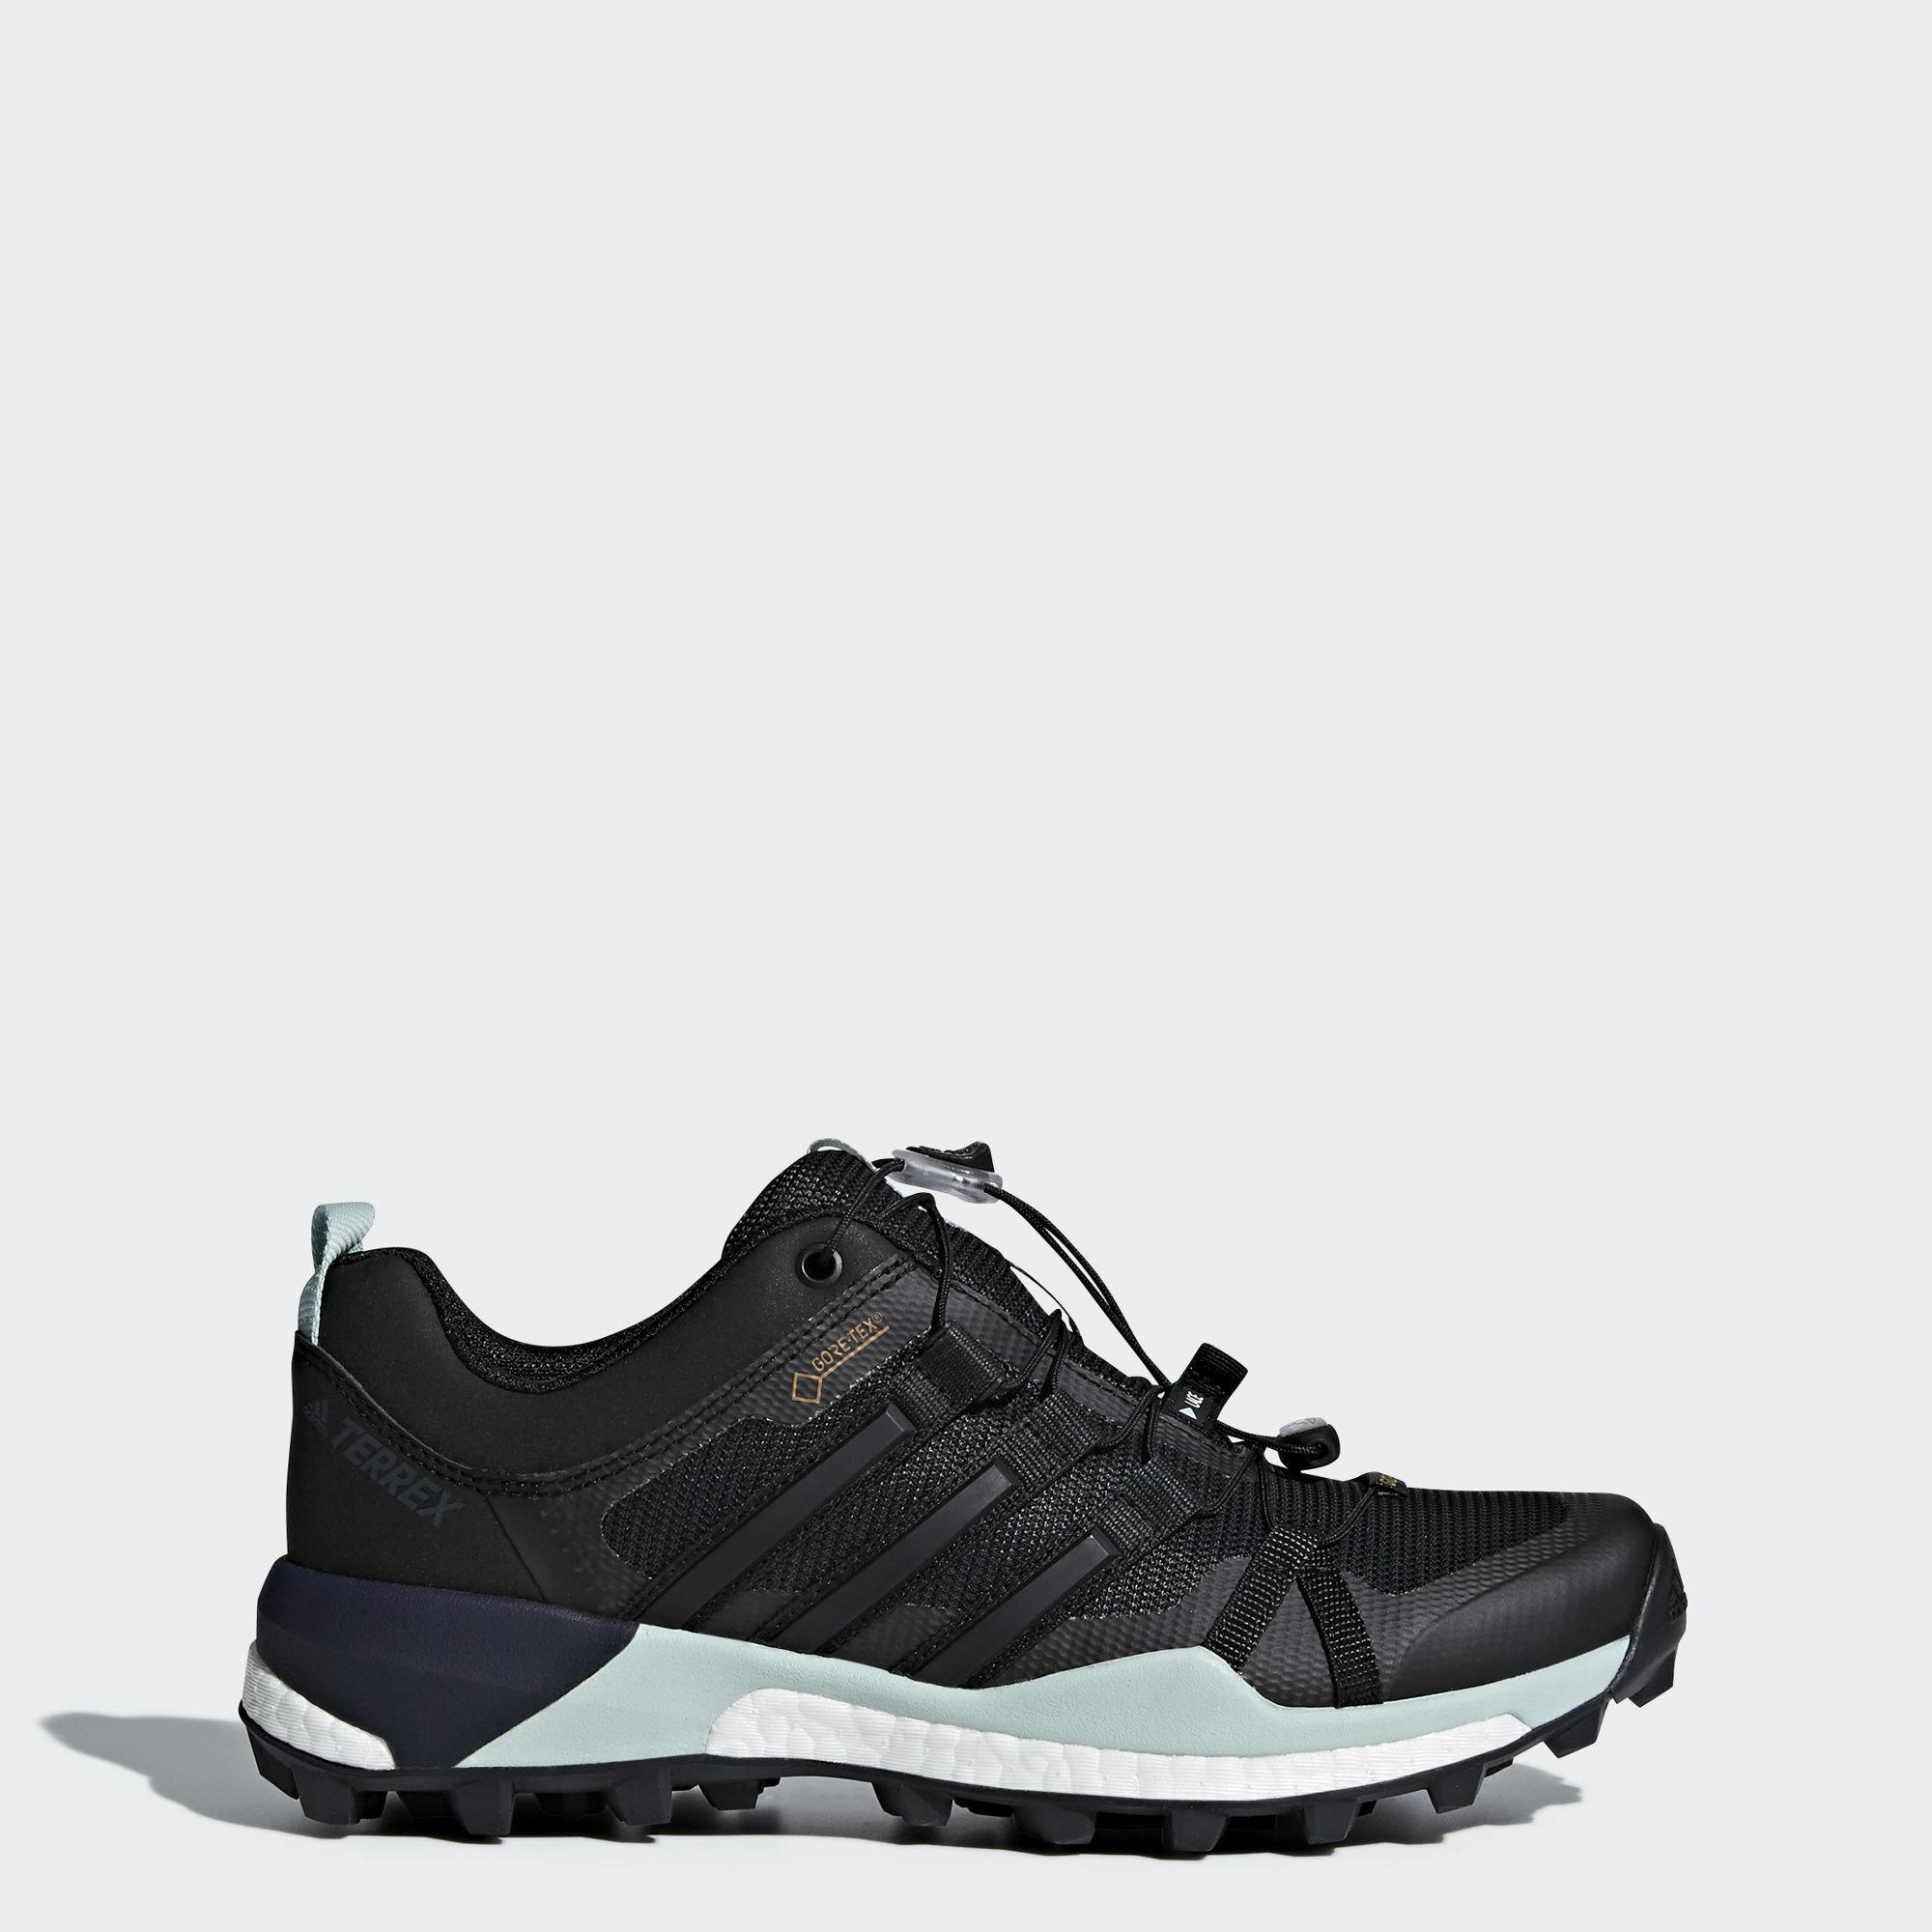 Обувь для трейлраннинга Terrex Skychaser GTX adidas TERREX Core Black/Core Black/Ash Green